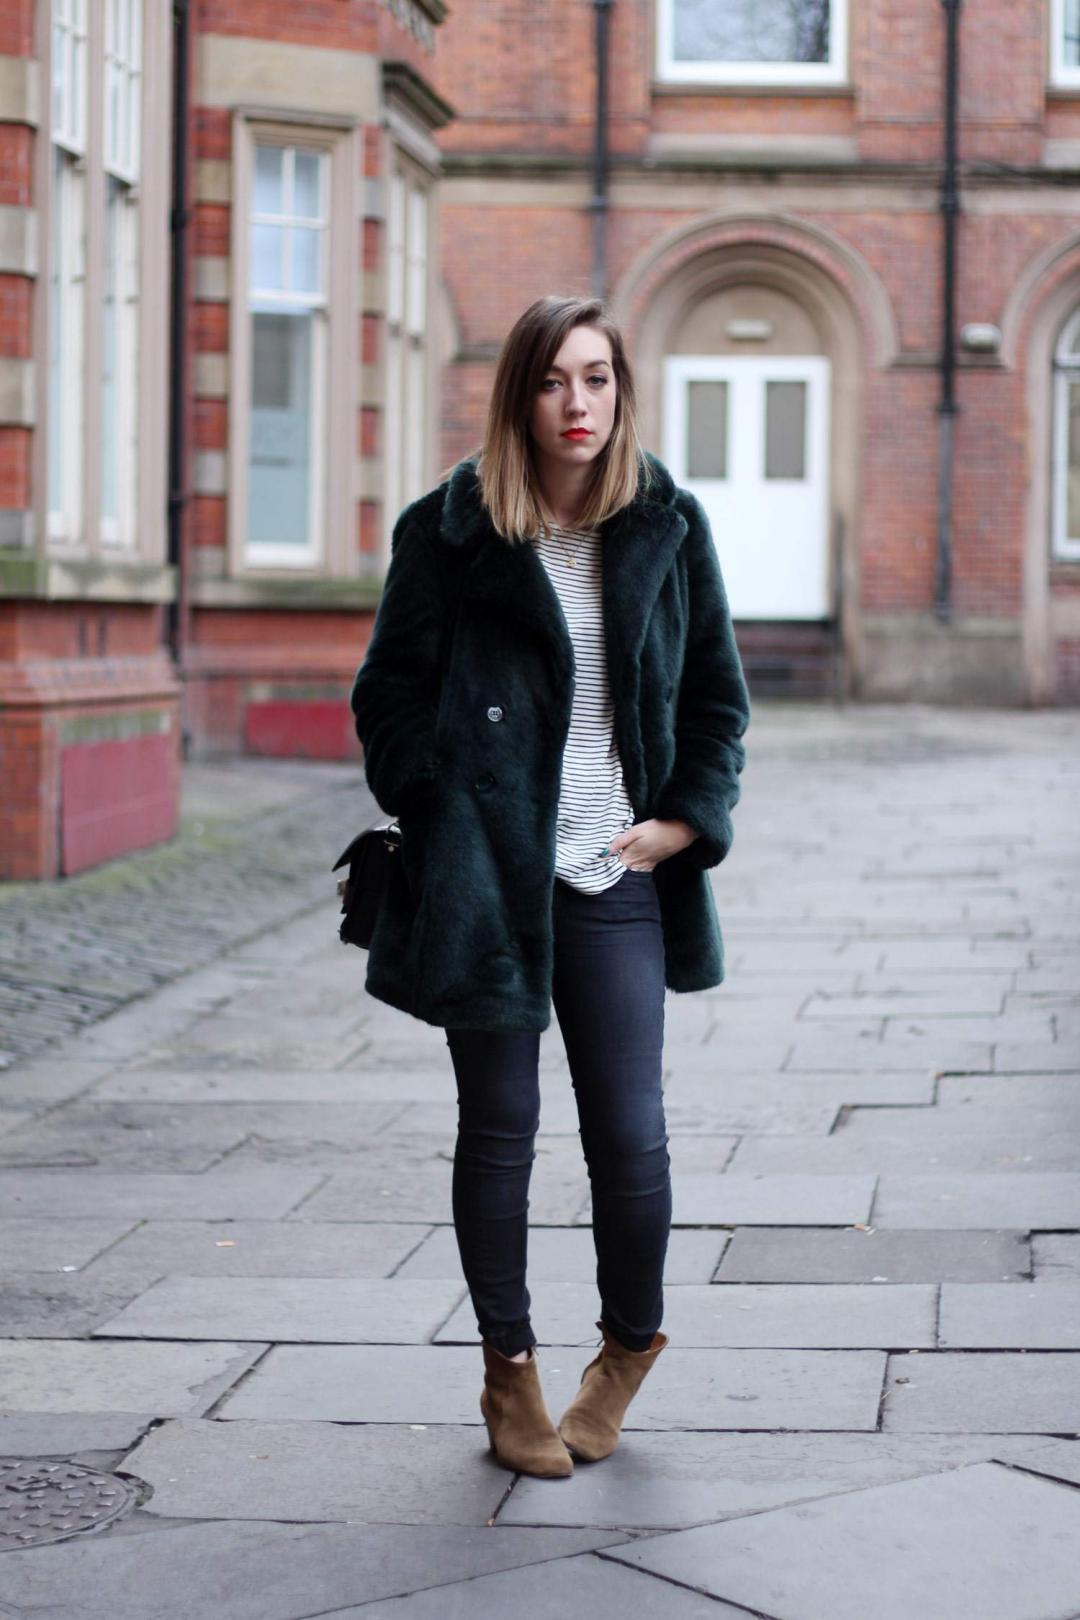 reiss-green-terri-fur-pea-coat-7-for-all-mankind-grey-jeans-isabel-marant-dicker-proenza-schouler-ps11